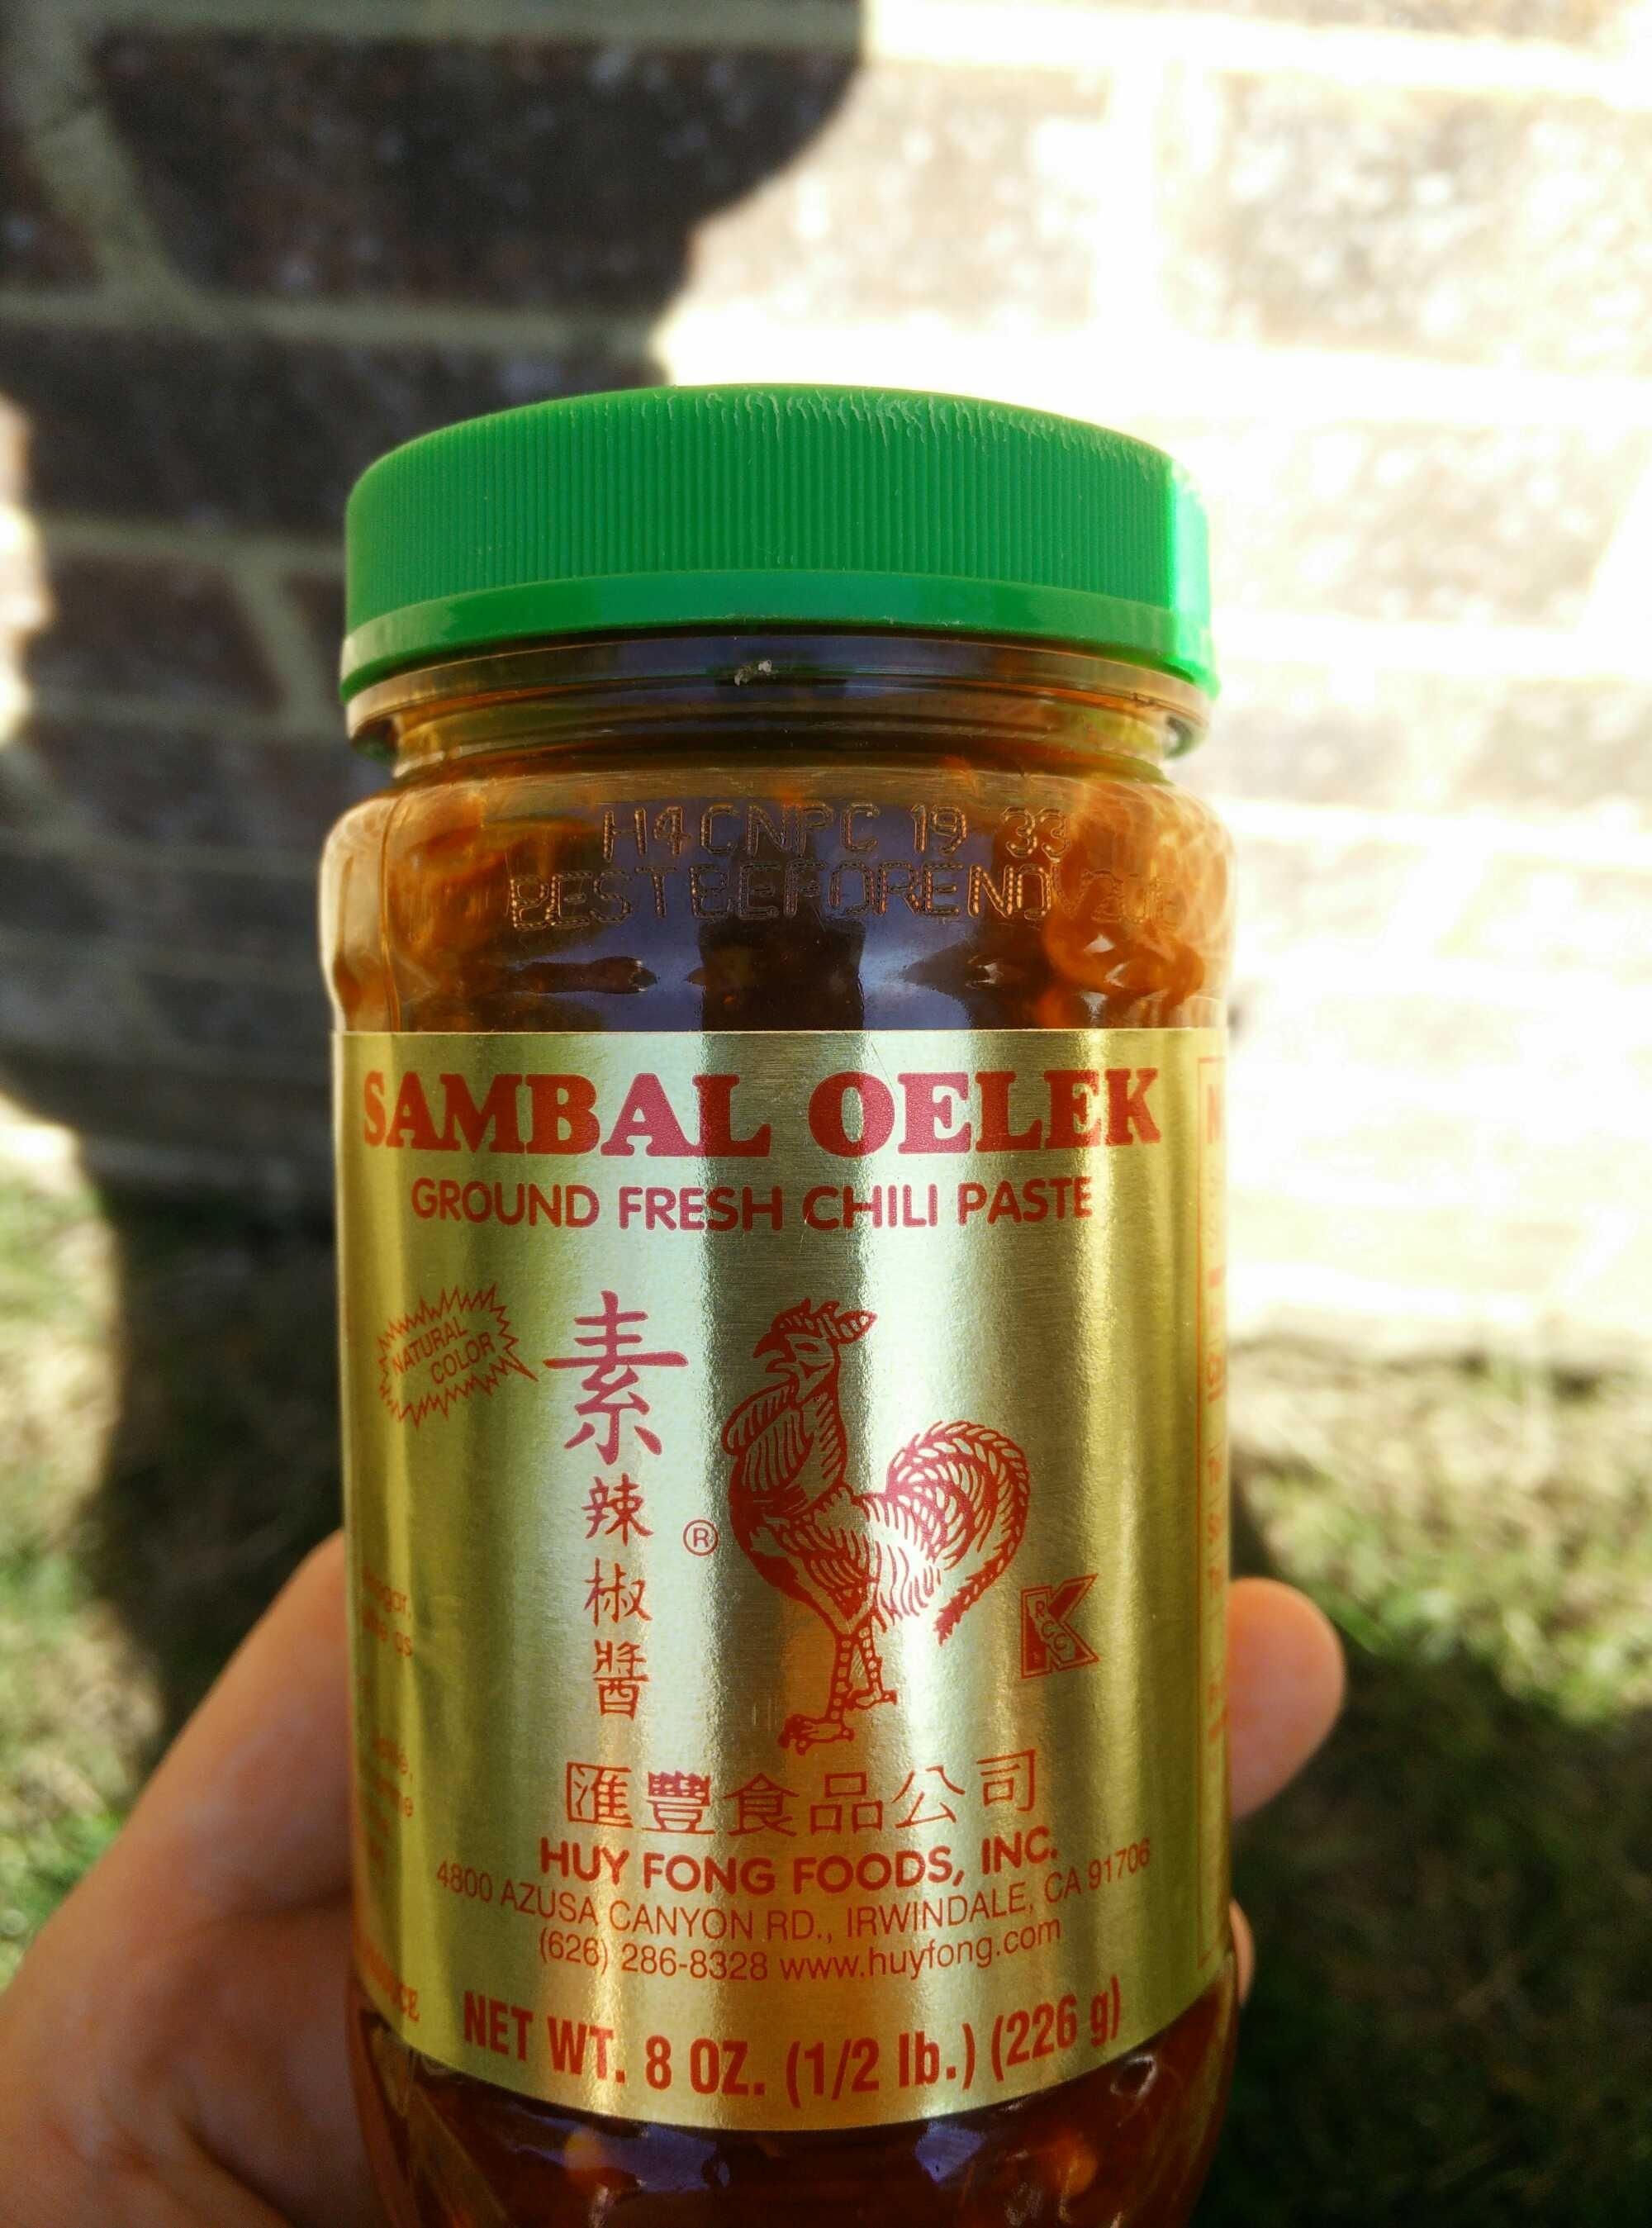 Ground Fresh Chili Paste - Product - en